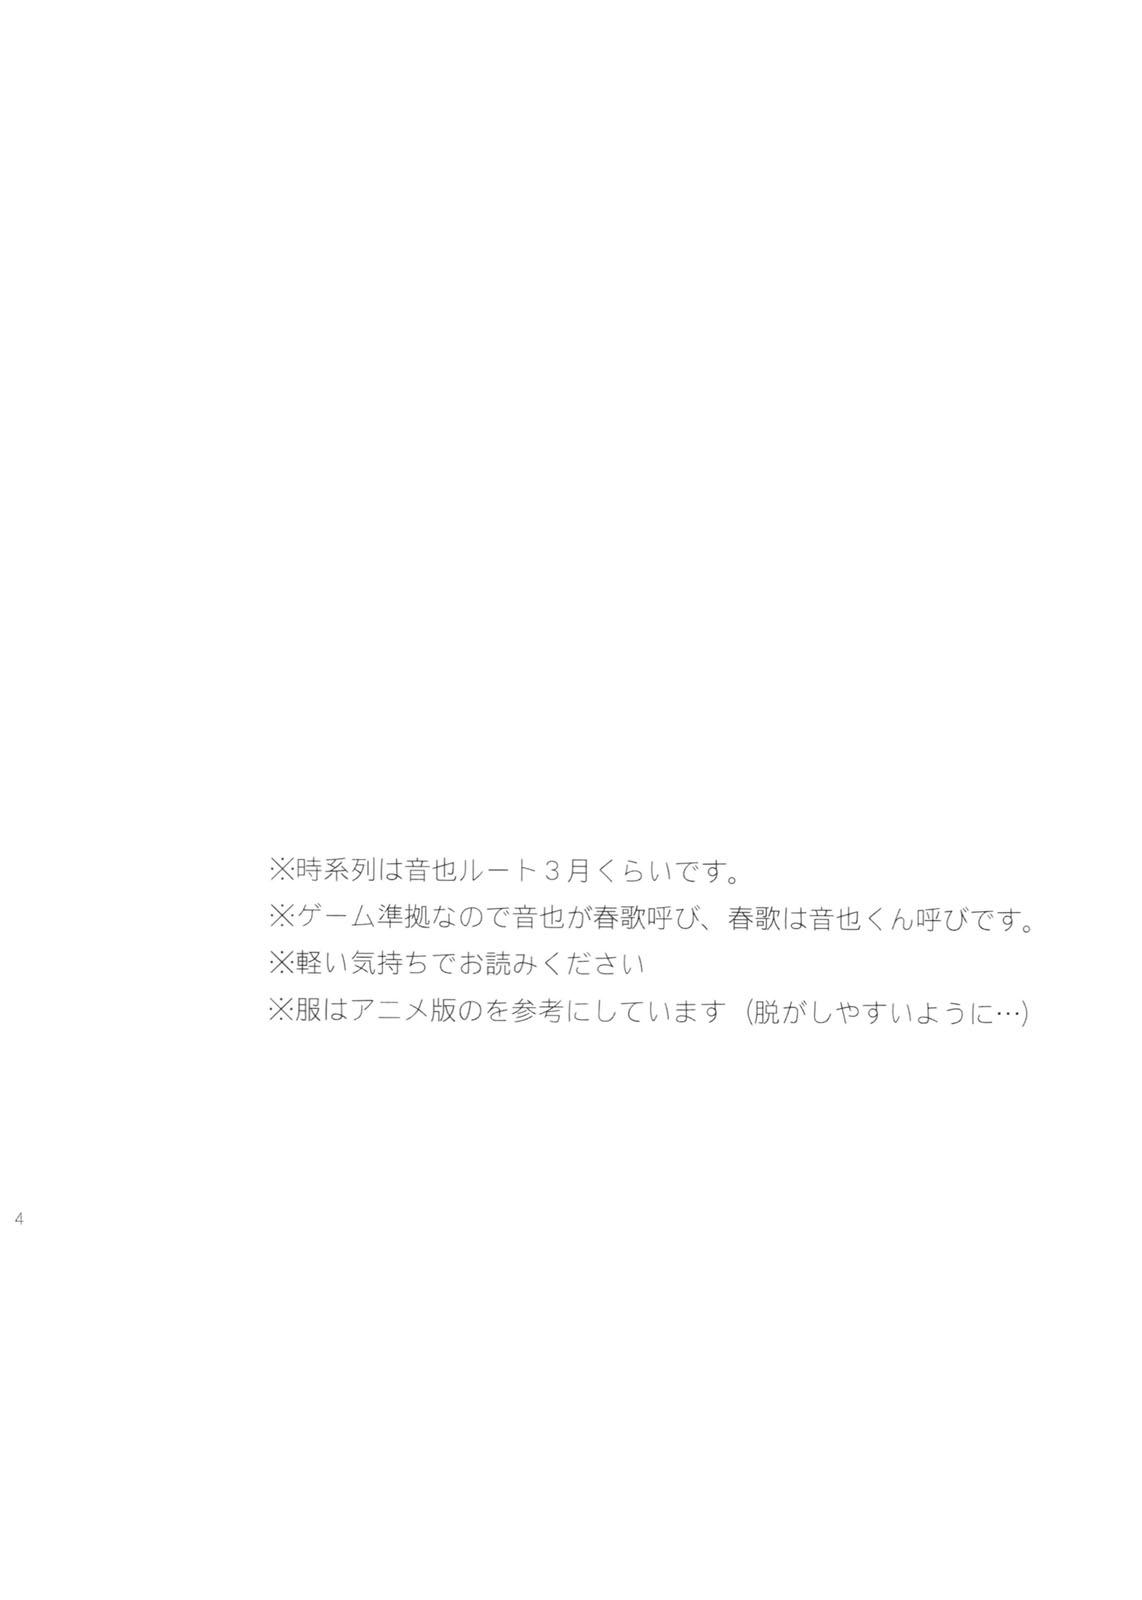 evergreen + Omake 2